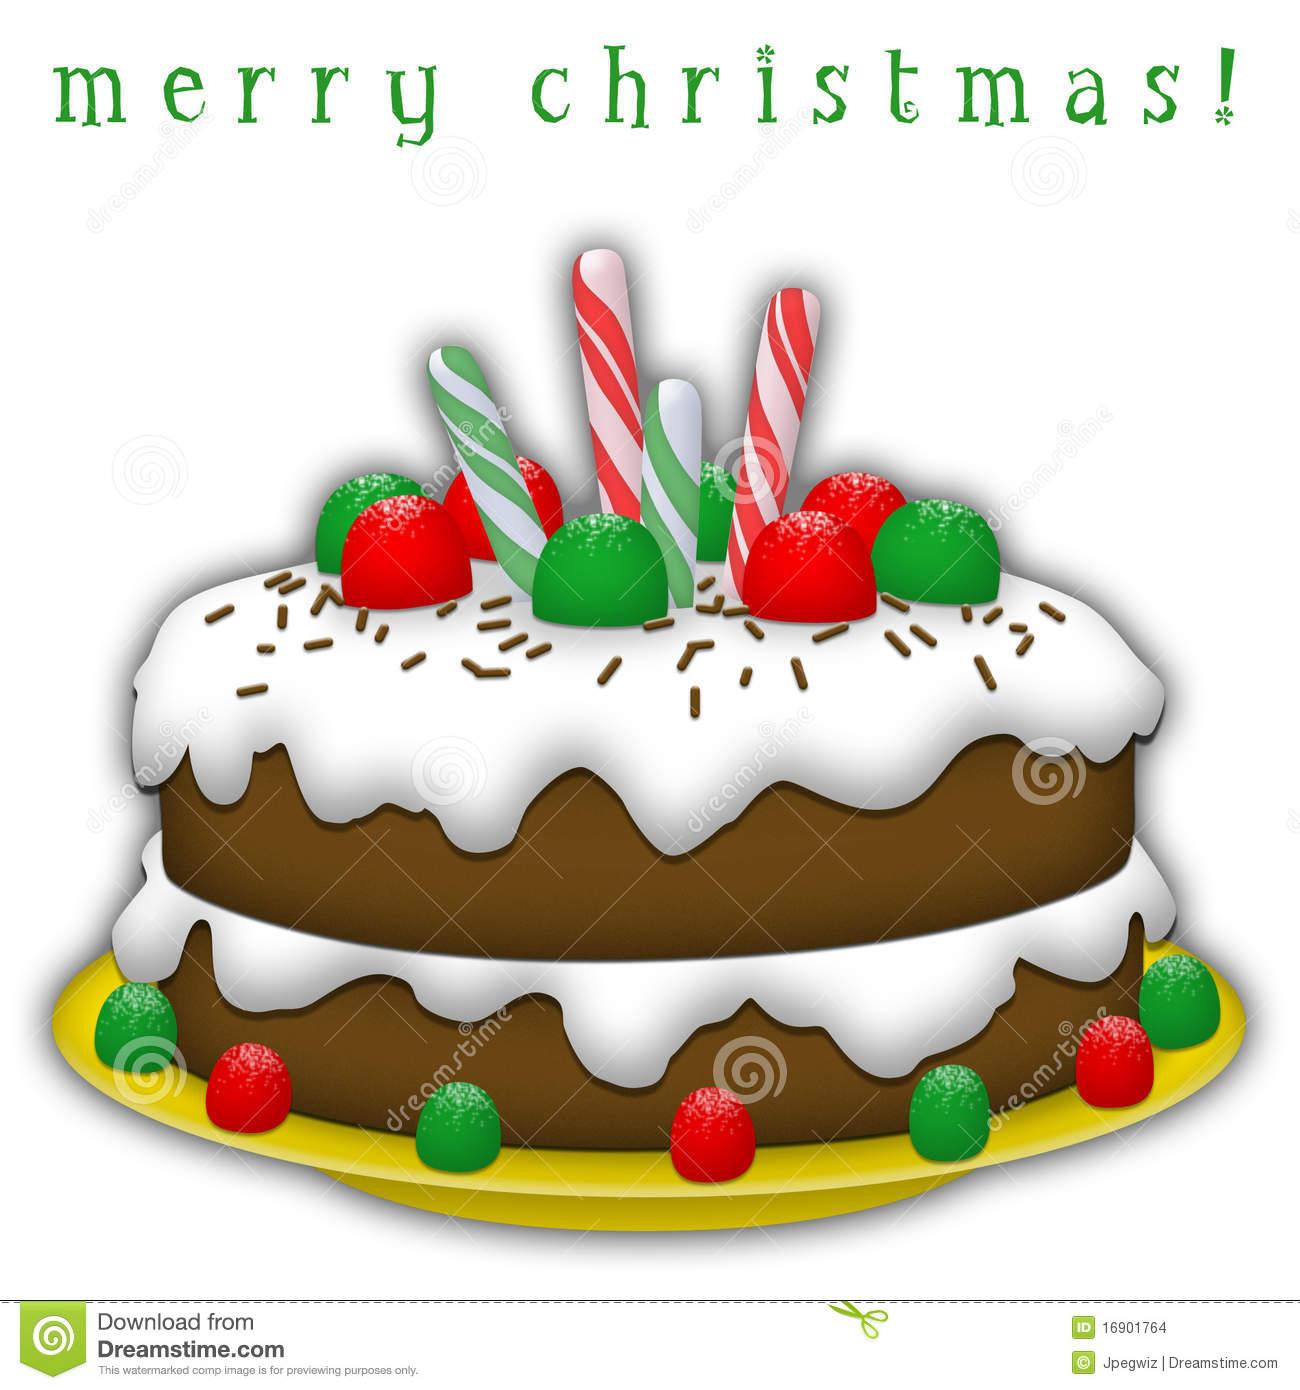 Free clipart clipartfest chocolate. Christmas birthday cake clip art